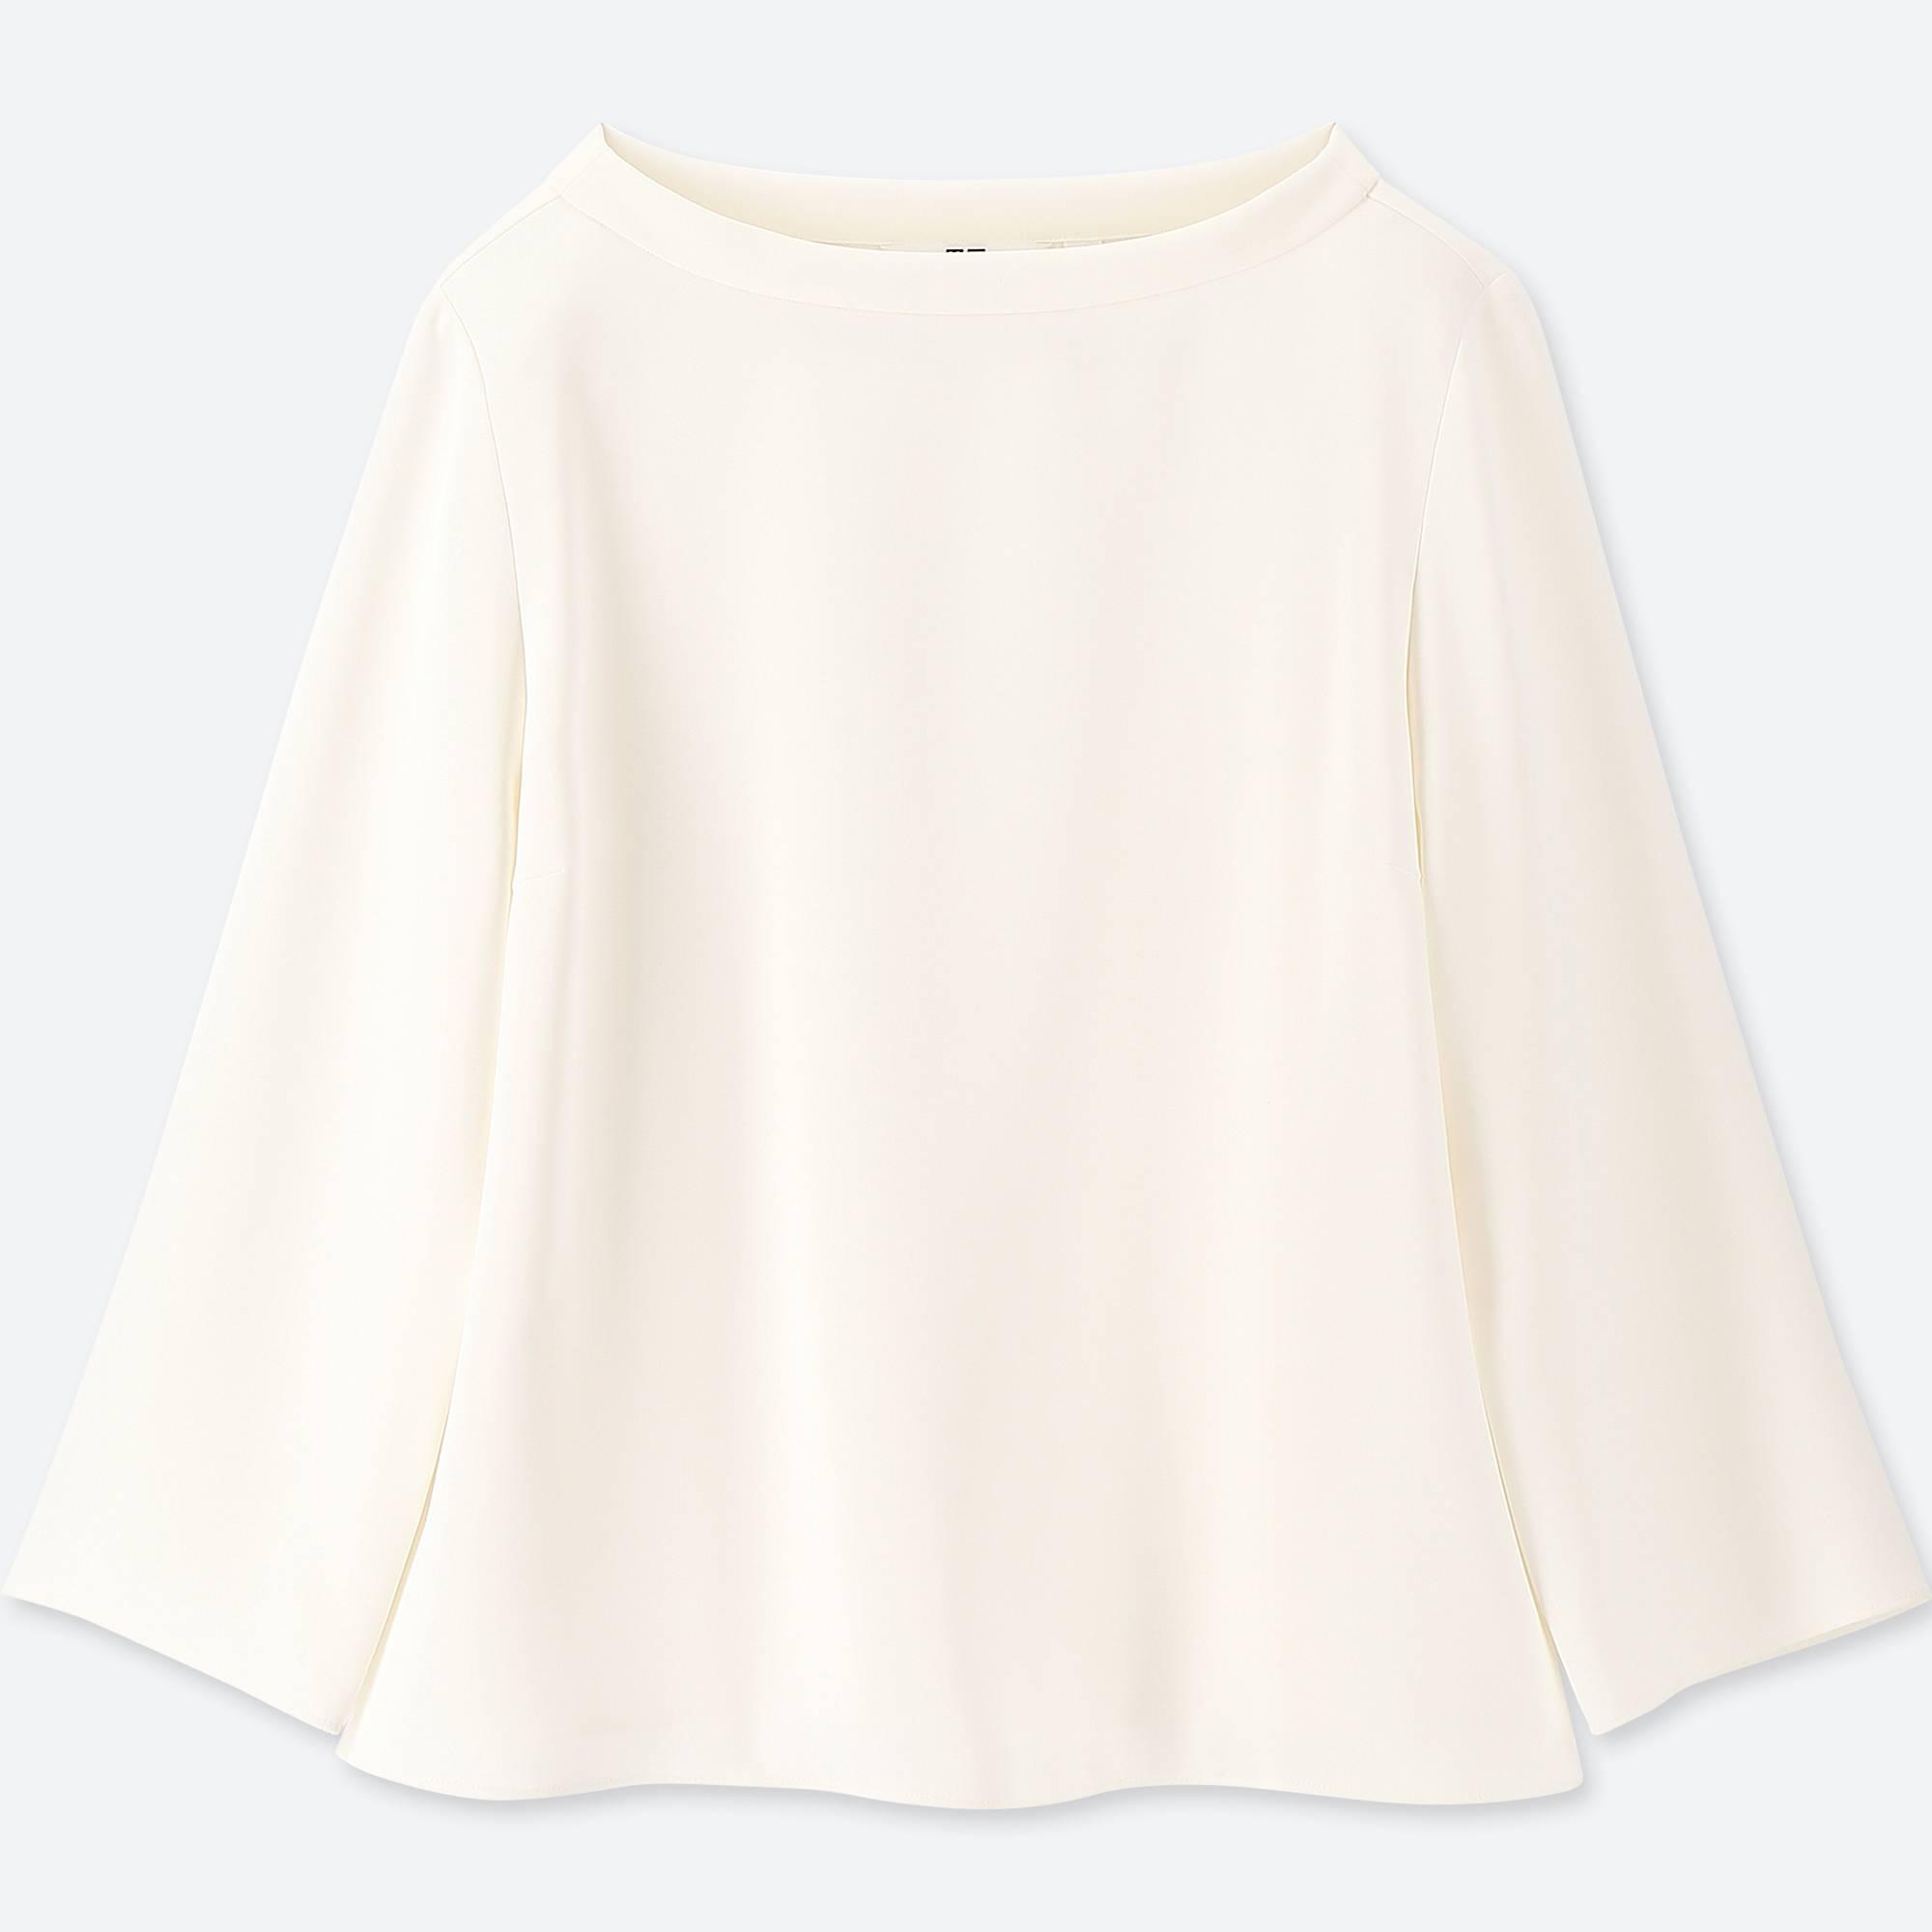 UNIQLO / Shirts And Blouses women drape 3/4 sleeve t-shirt blouse